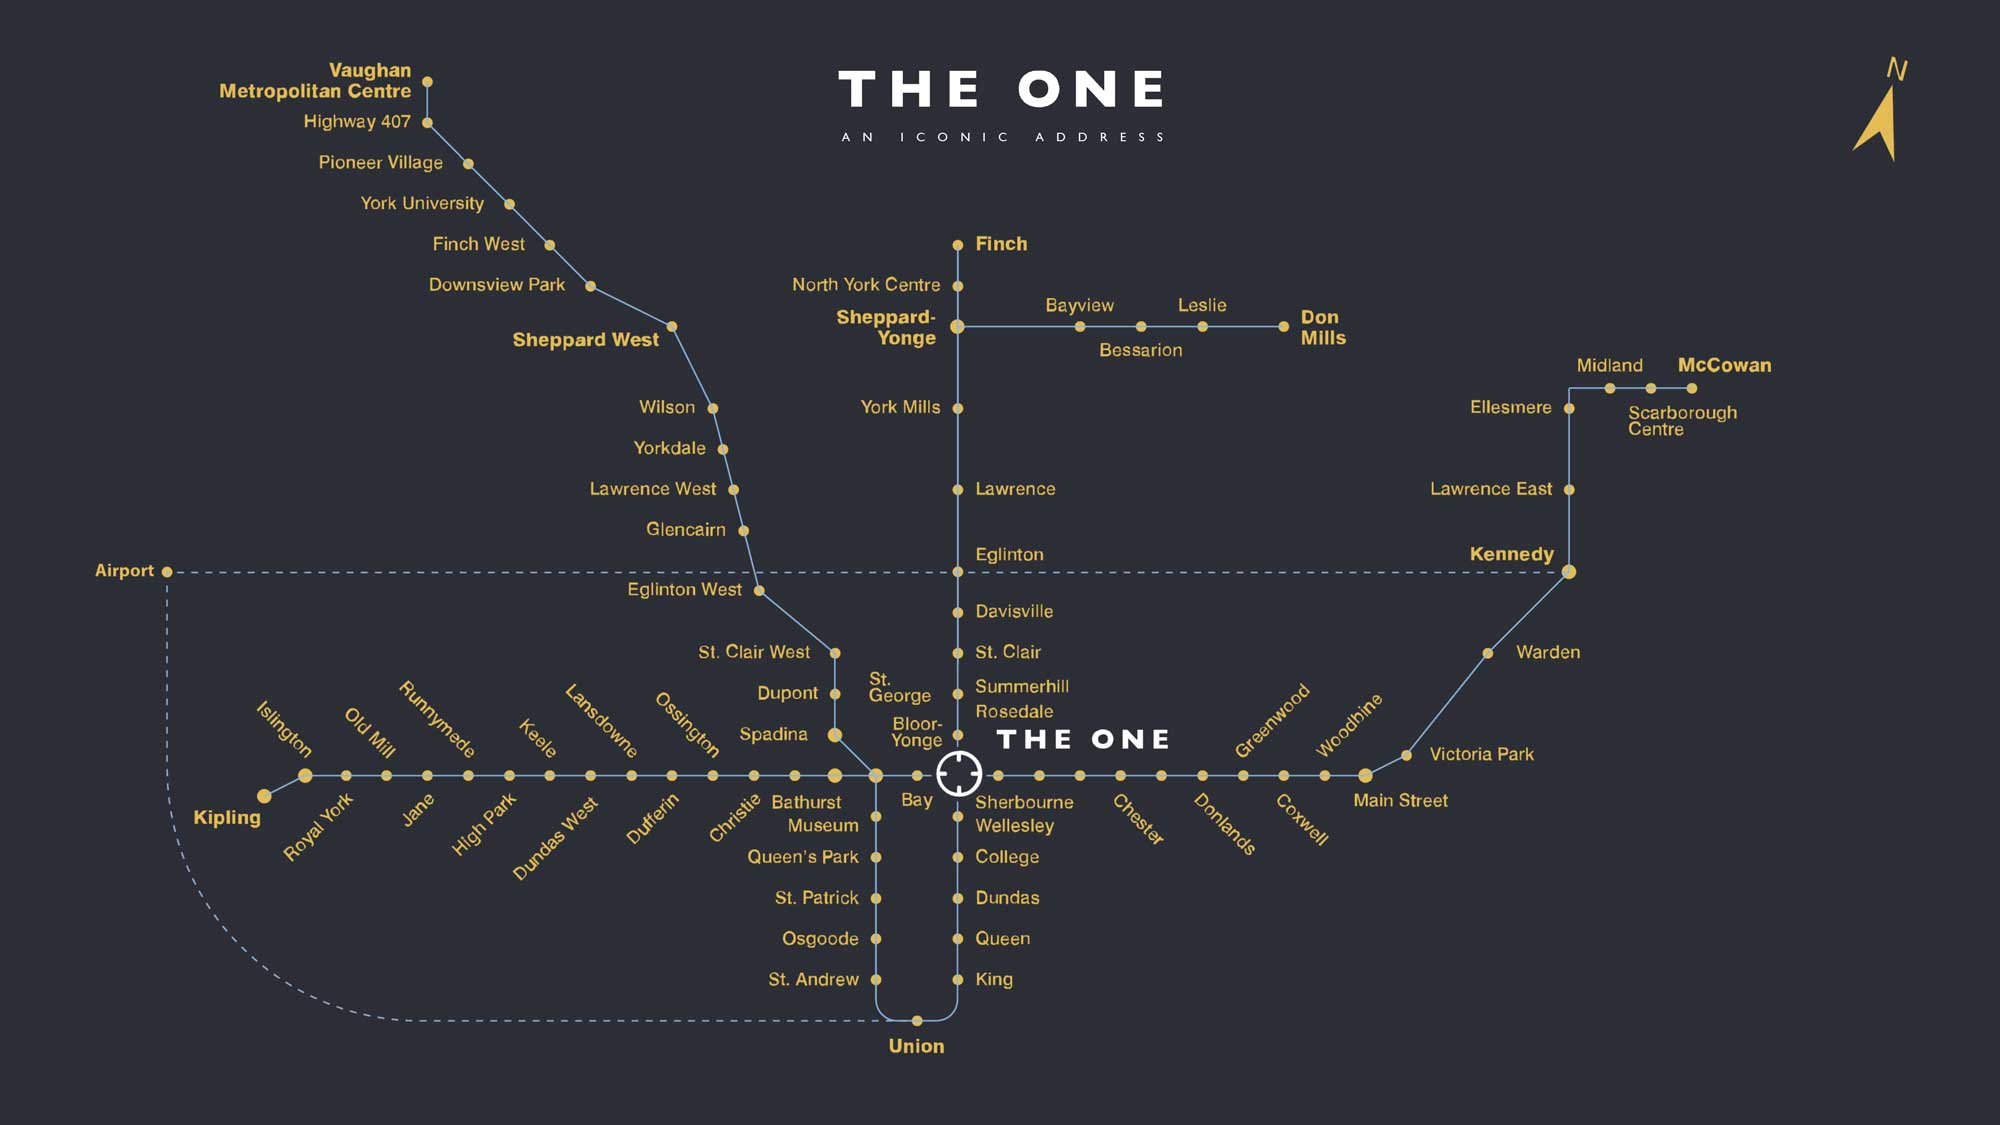 The One Bloo rWest Iconic AddressTTC